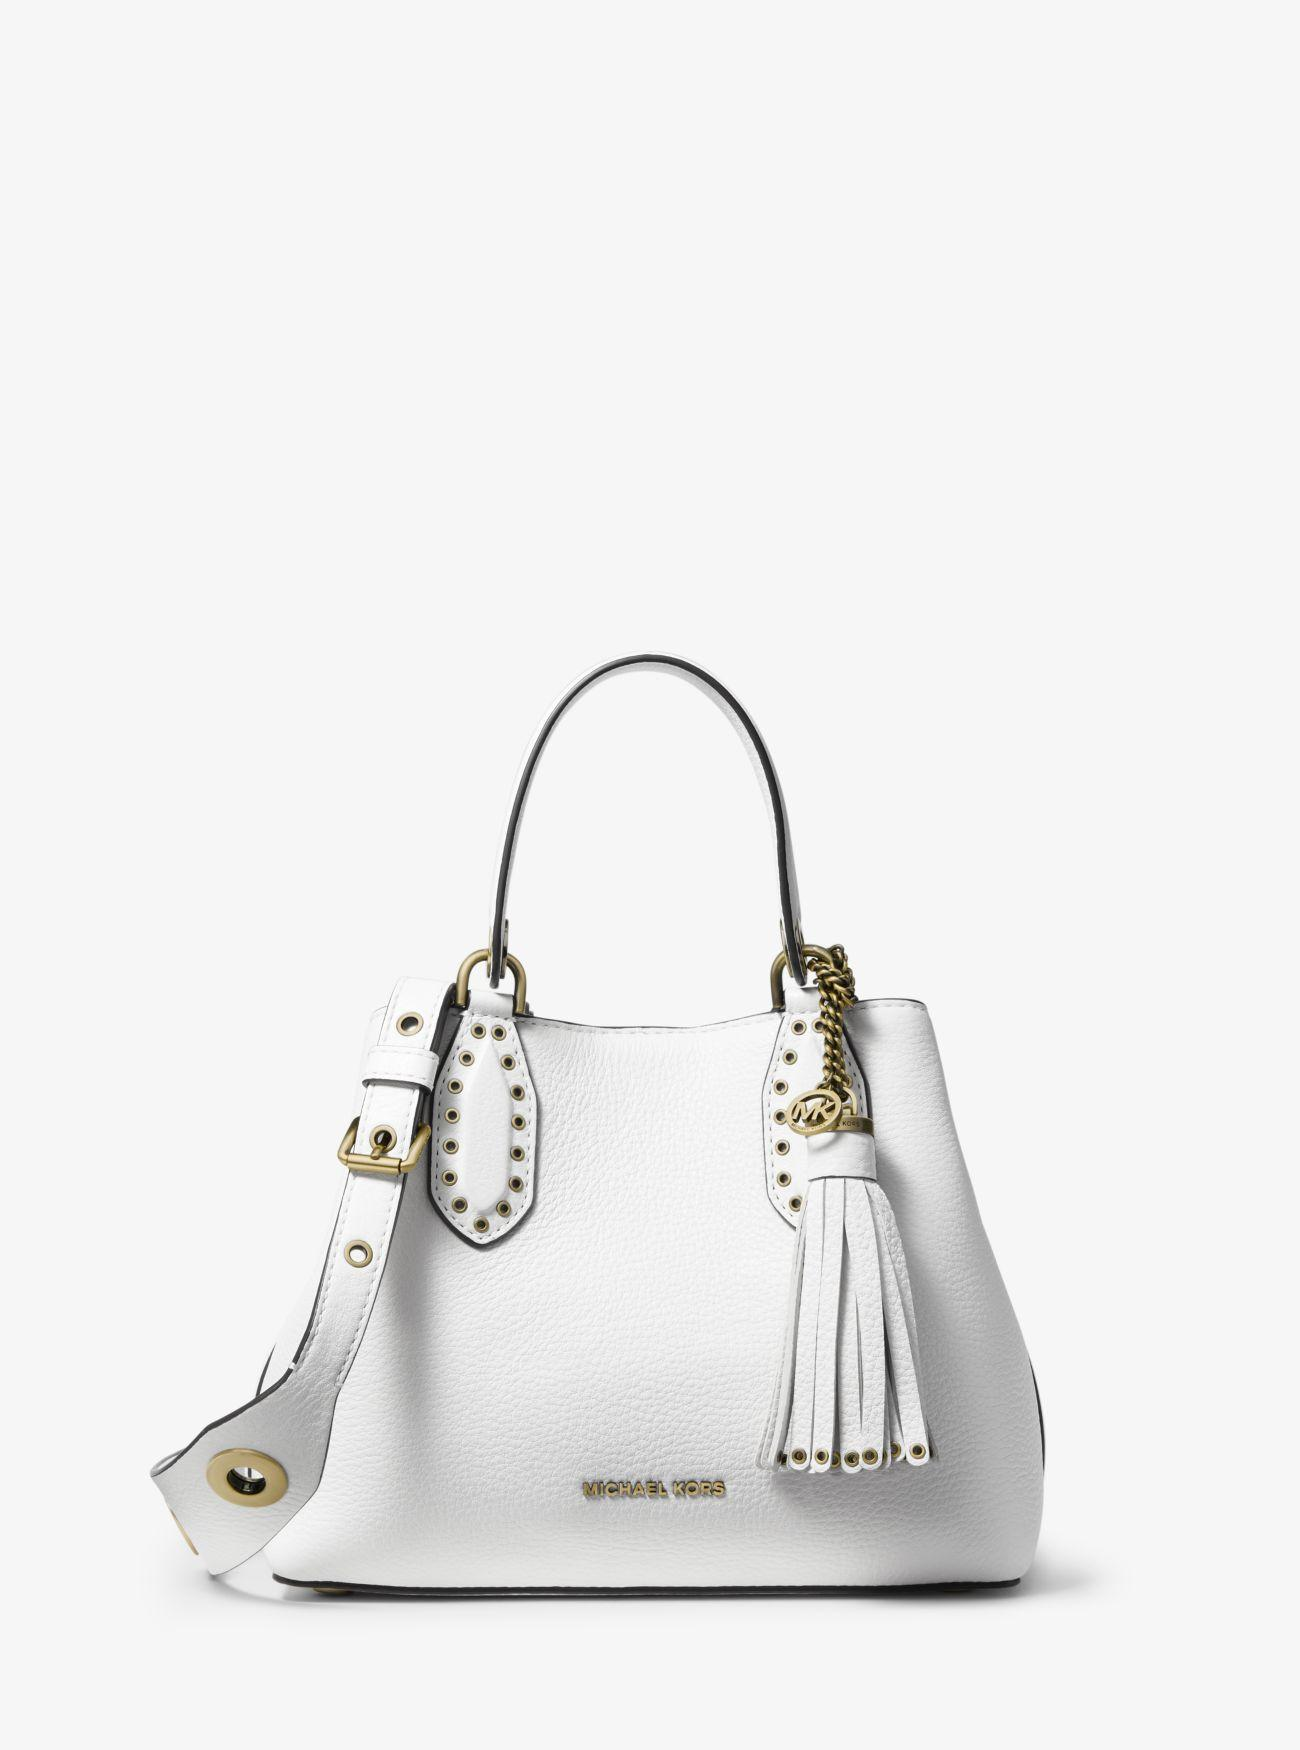 13521e2c8ad5 Michael Kors - White Brooklyn Small Pebbled Leather Satchel - Lyst. View  fullscreen